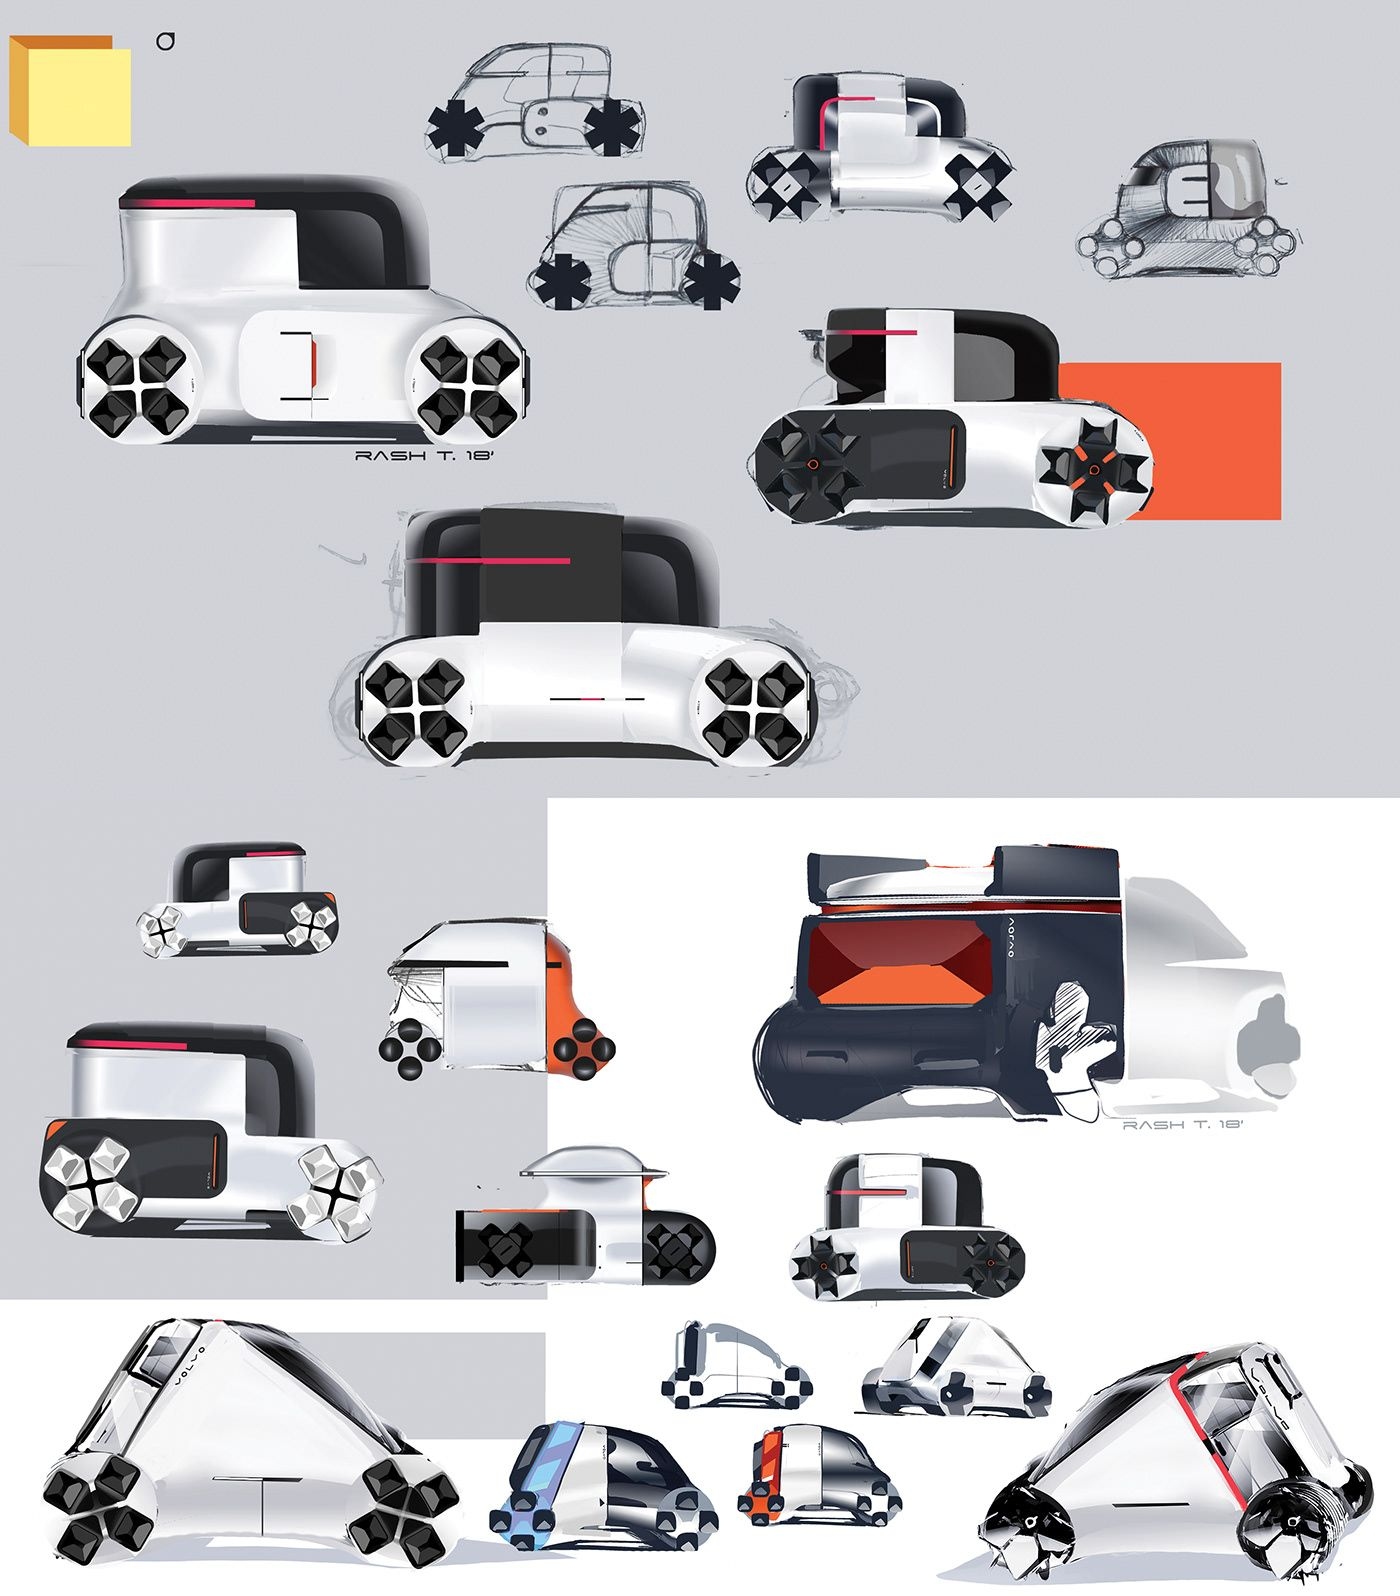 Volvo Pv Master Thesis On Behance Concept Car Design Automotive Design Transportation Design